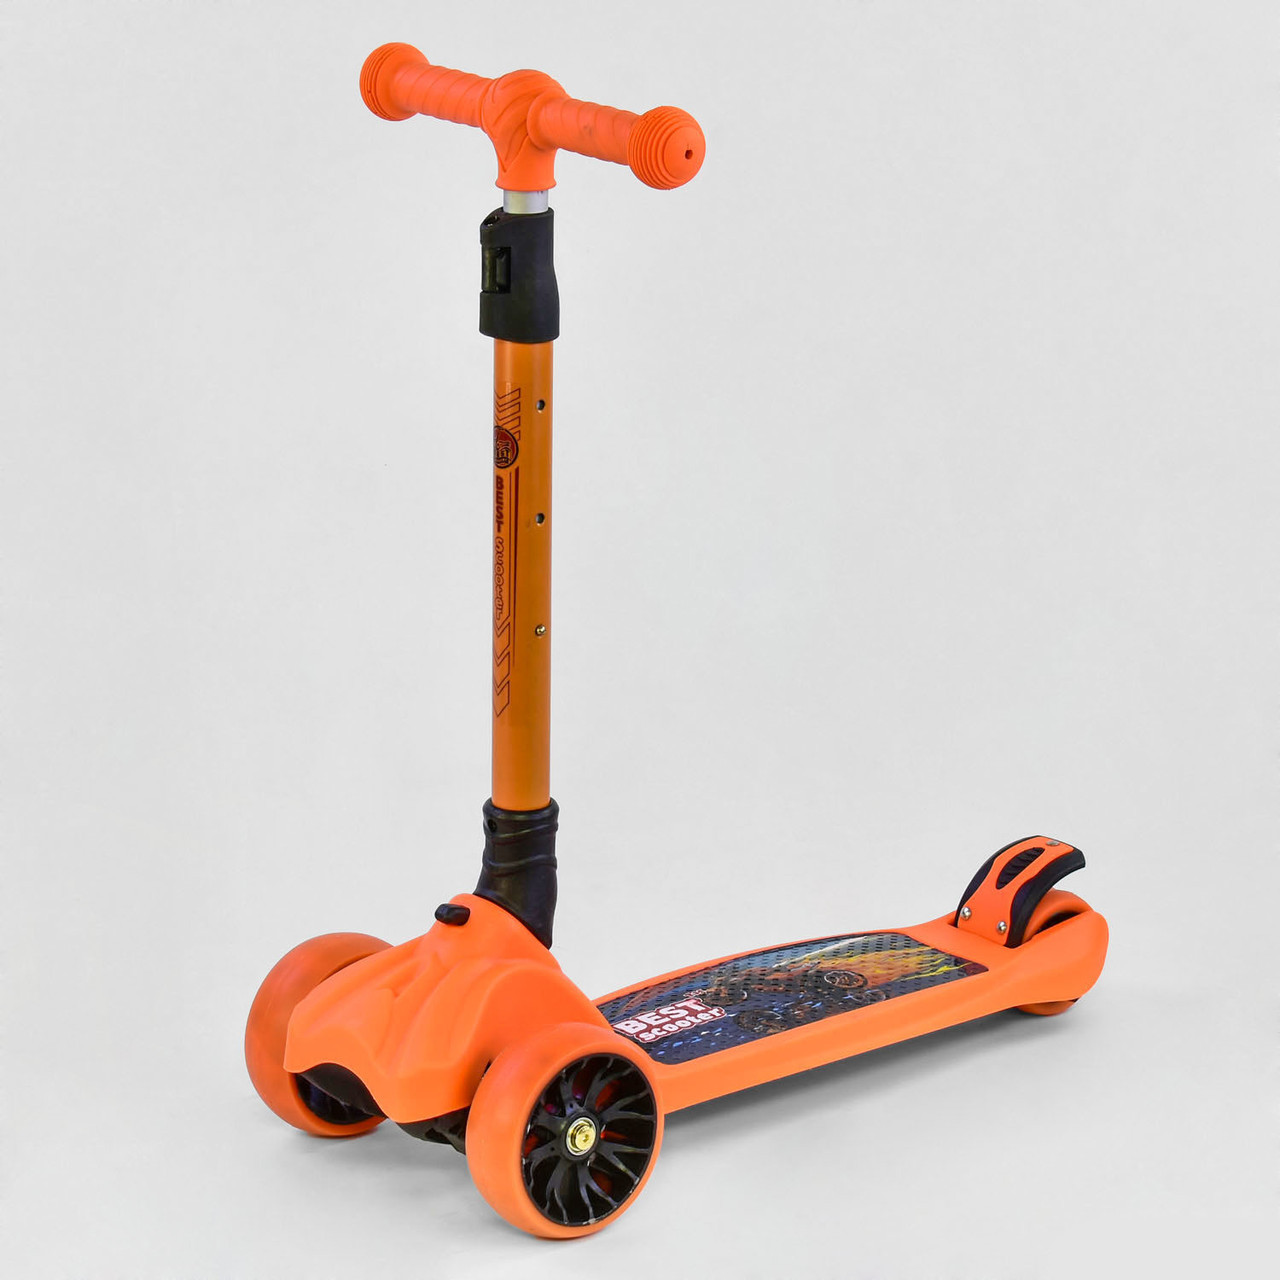 Самокат BEST SCOOTER F-16770 оранжевый